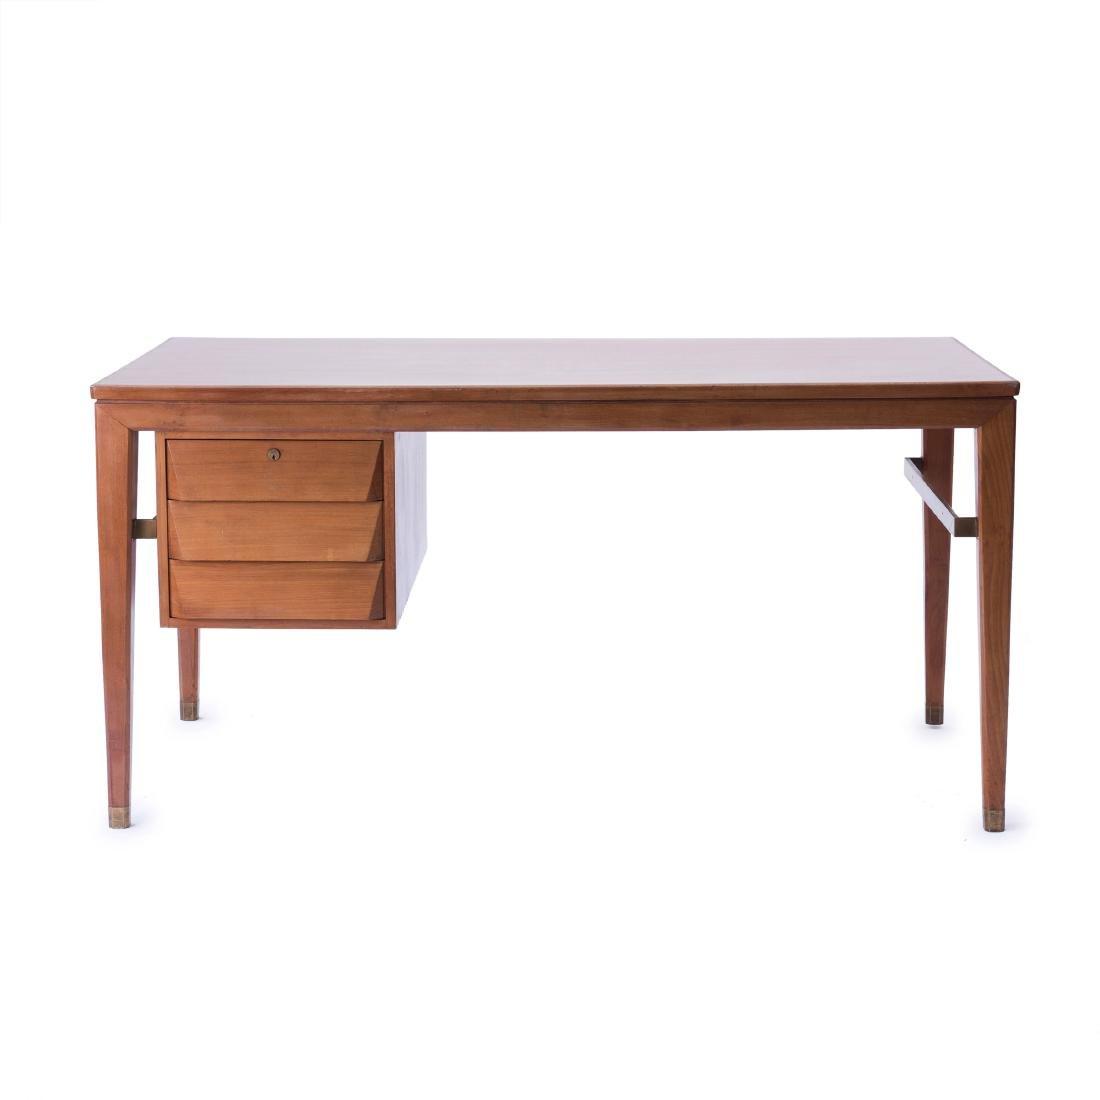 'BNL' desk, 1954